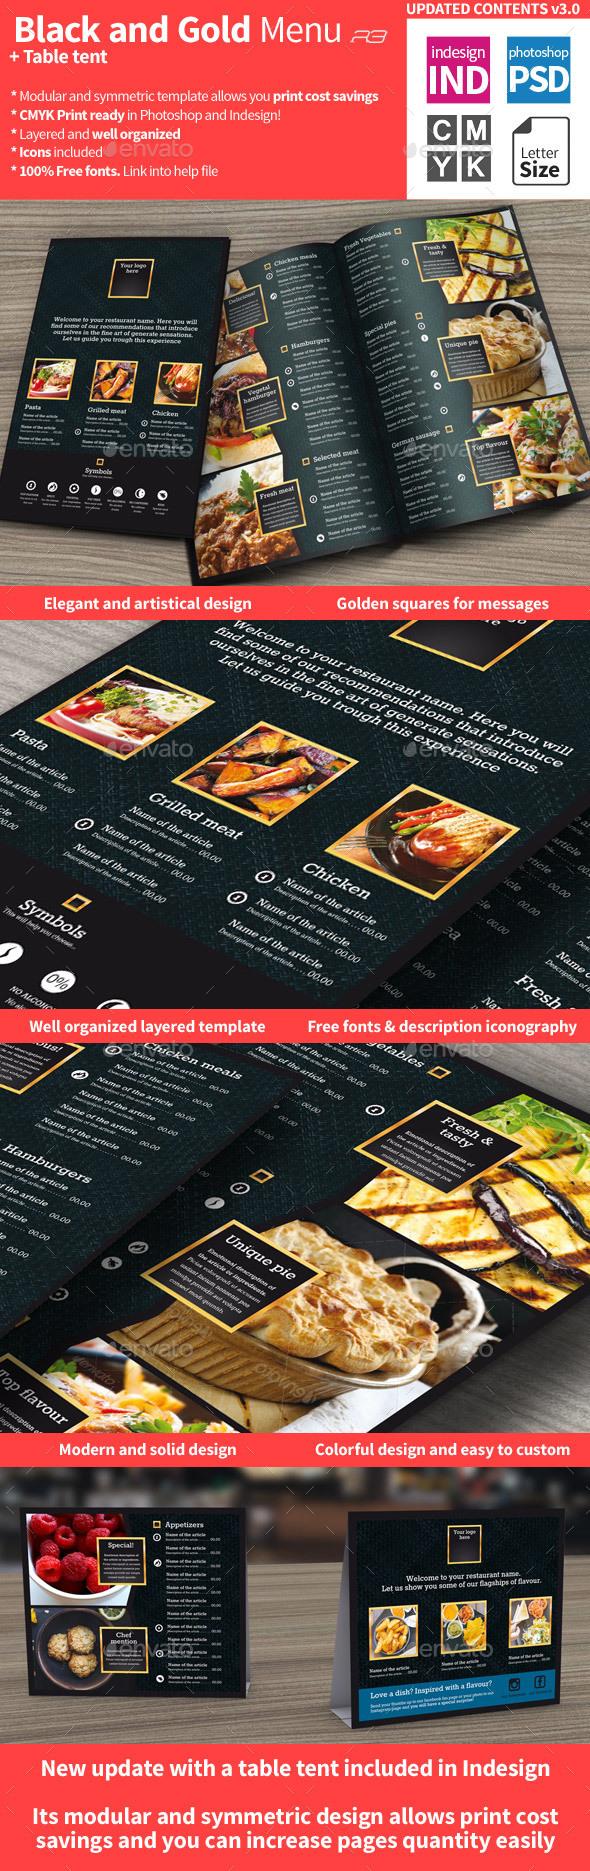 Menu Graphics Designs Templates From Graphicriver